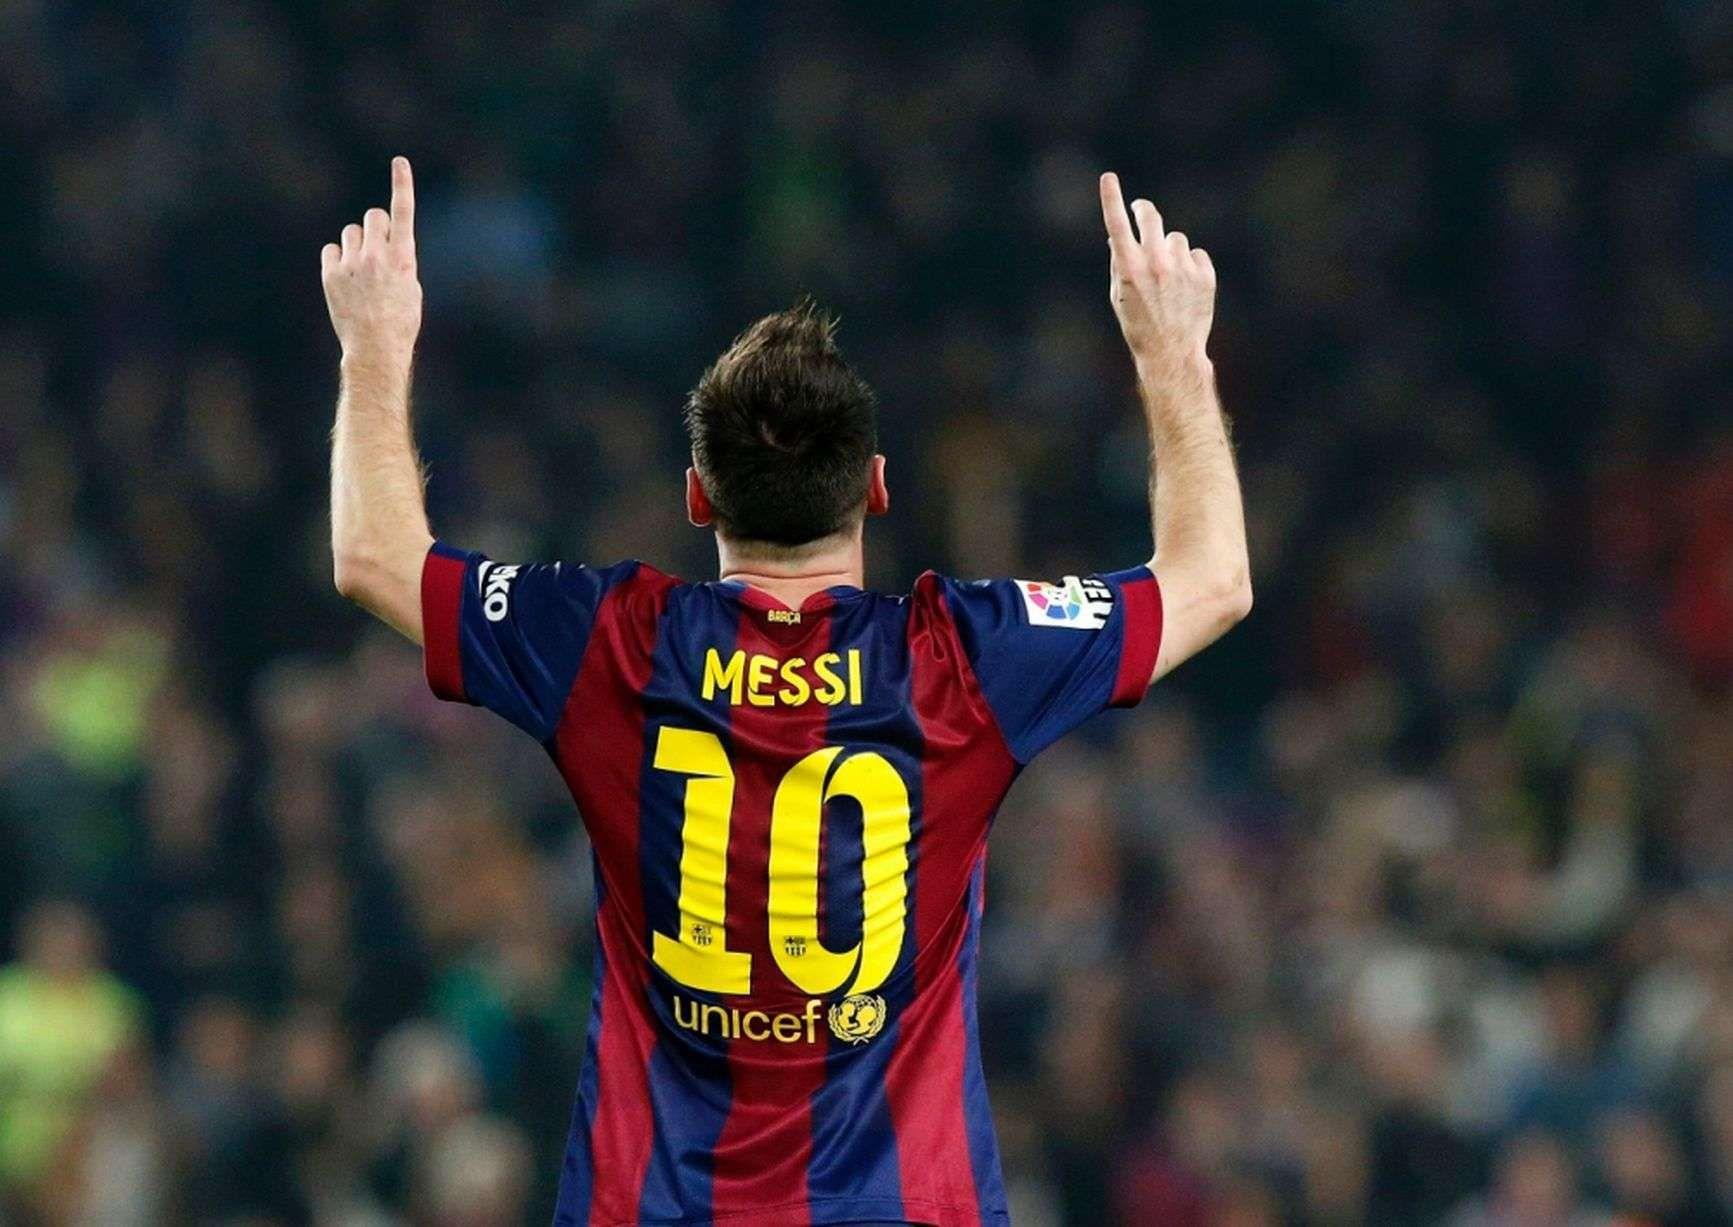 Lionel Messi Iphone Hd Wallpaper 1600 1000 Messi Hd Wallpaper 64 Wallpapers Adorable Wallpapers Messi Lionel Messi Messi Signature